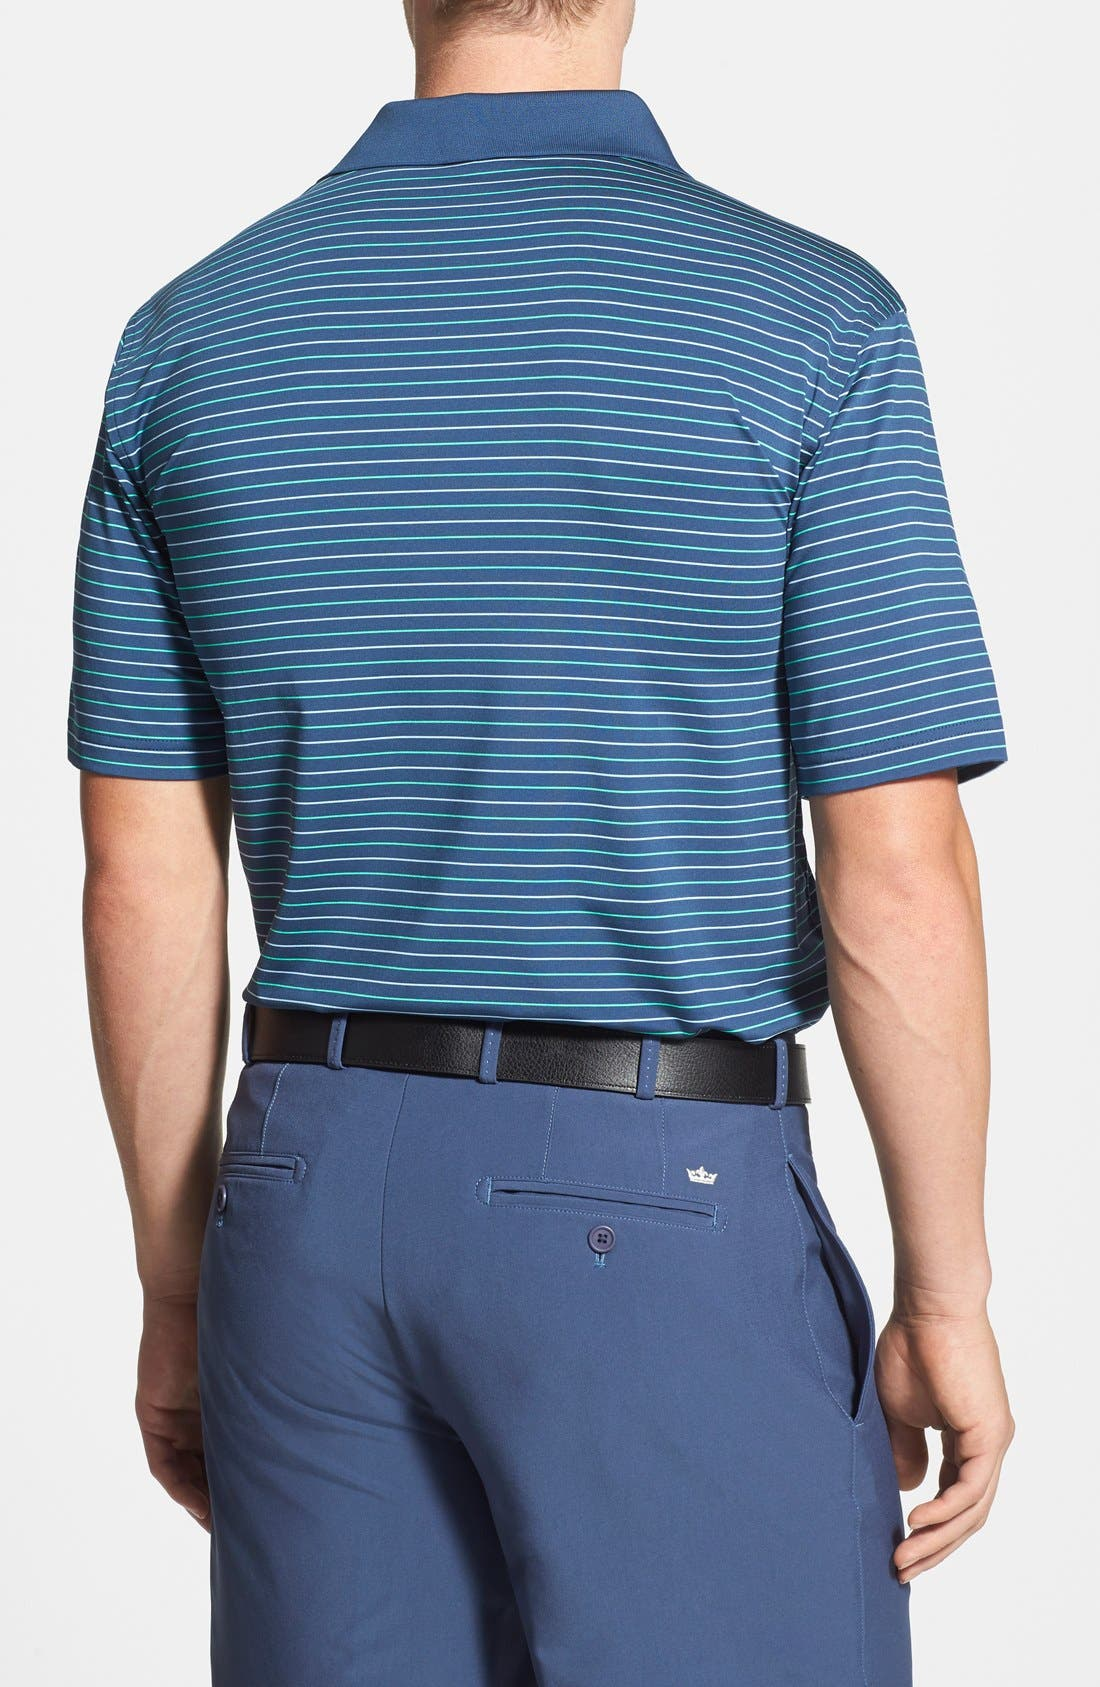 Alternate Image 2  - Peter Millar 'Harnett' Stripe Stretch Jersey Polo